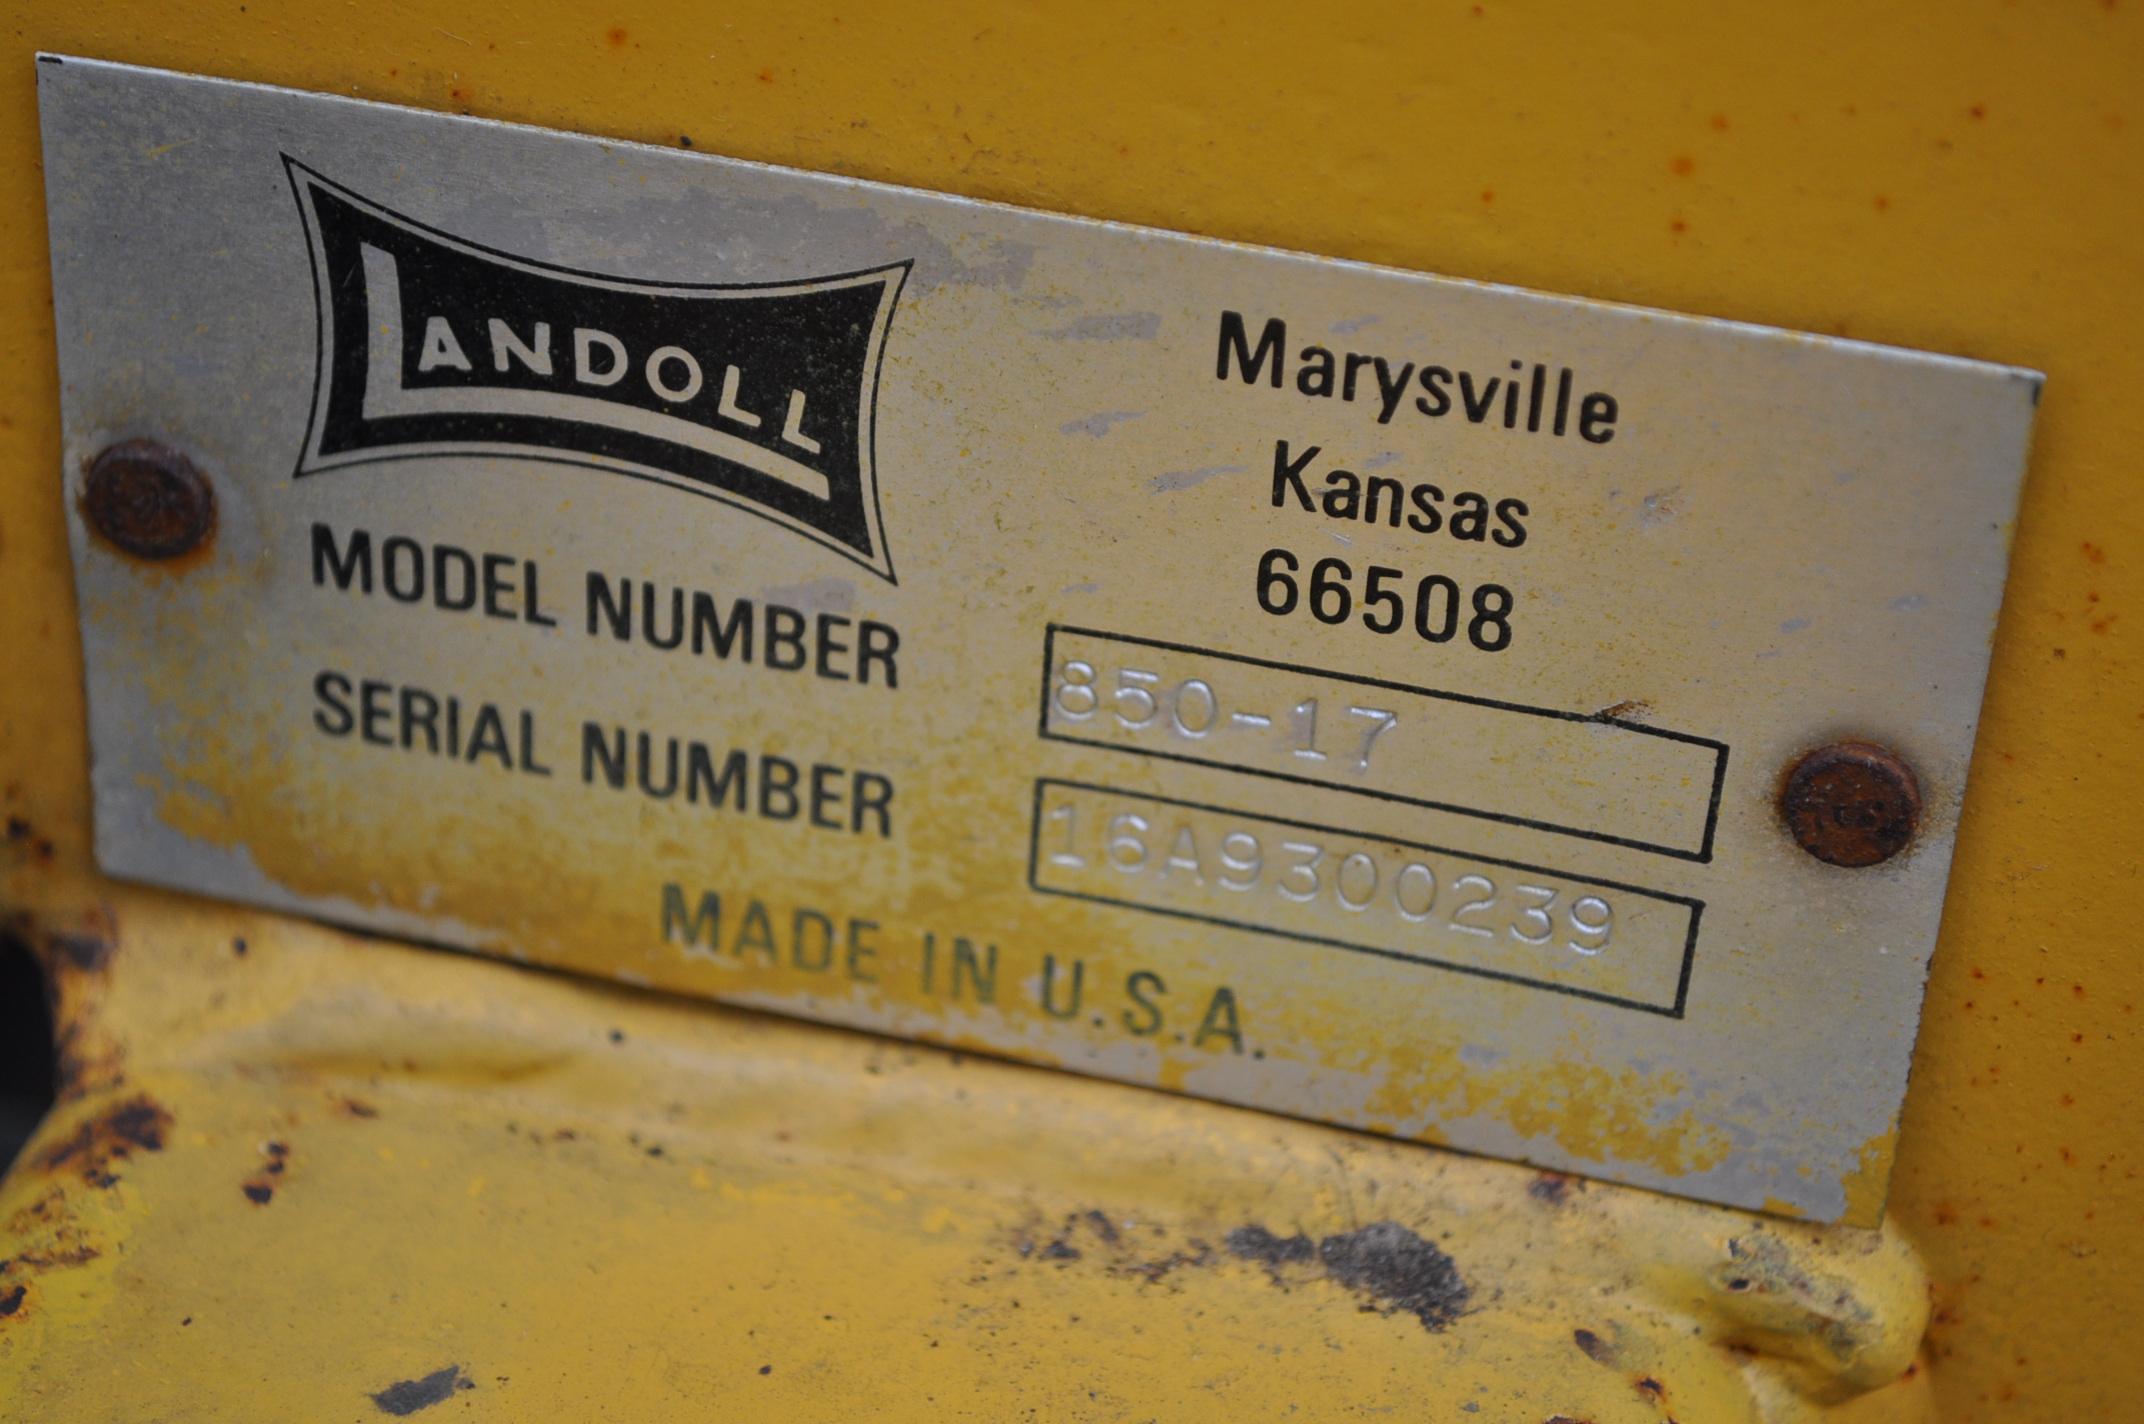 "17' Landoll Finisholl 850 mulch finisher, front blades, 9"" sweeps, 3 bar drag, hyd fold - Image 17 of 18"